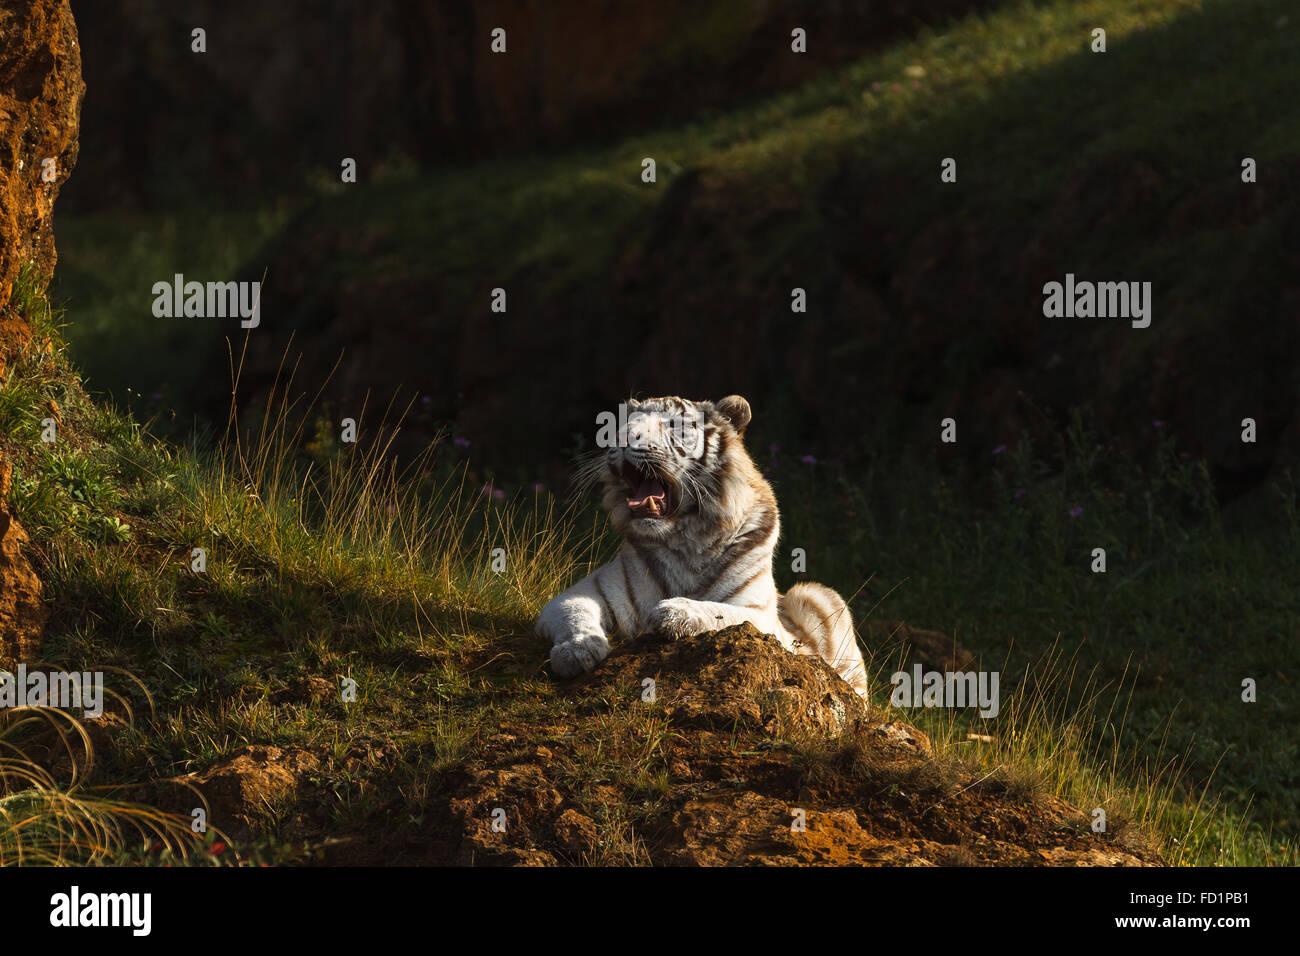 A white tiger (Panthera tigris tigris) resting in Cabarceno Nature Park, Cantabria, Spain. Stock Photo